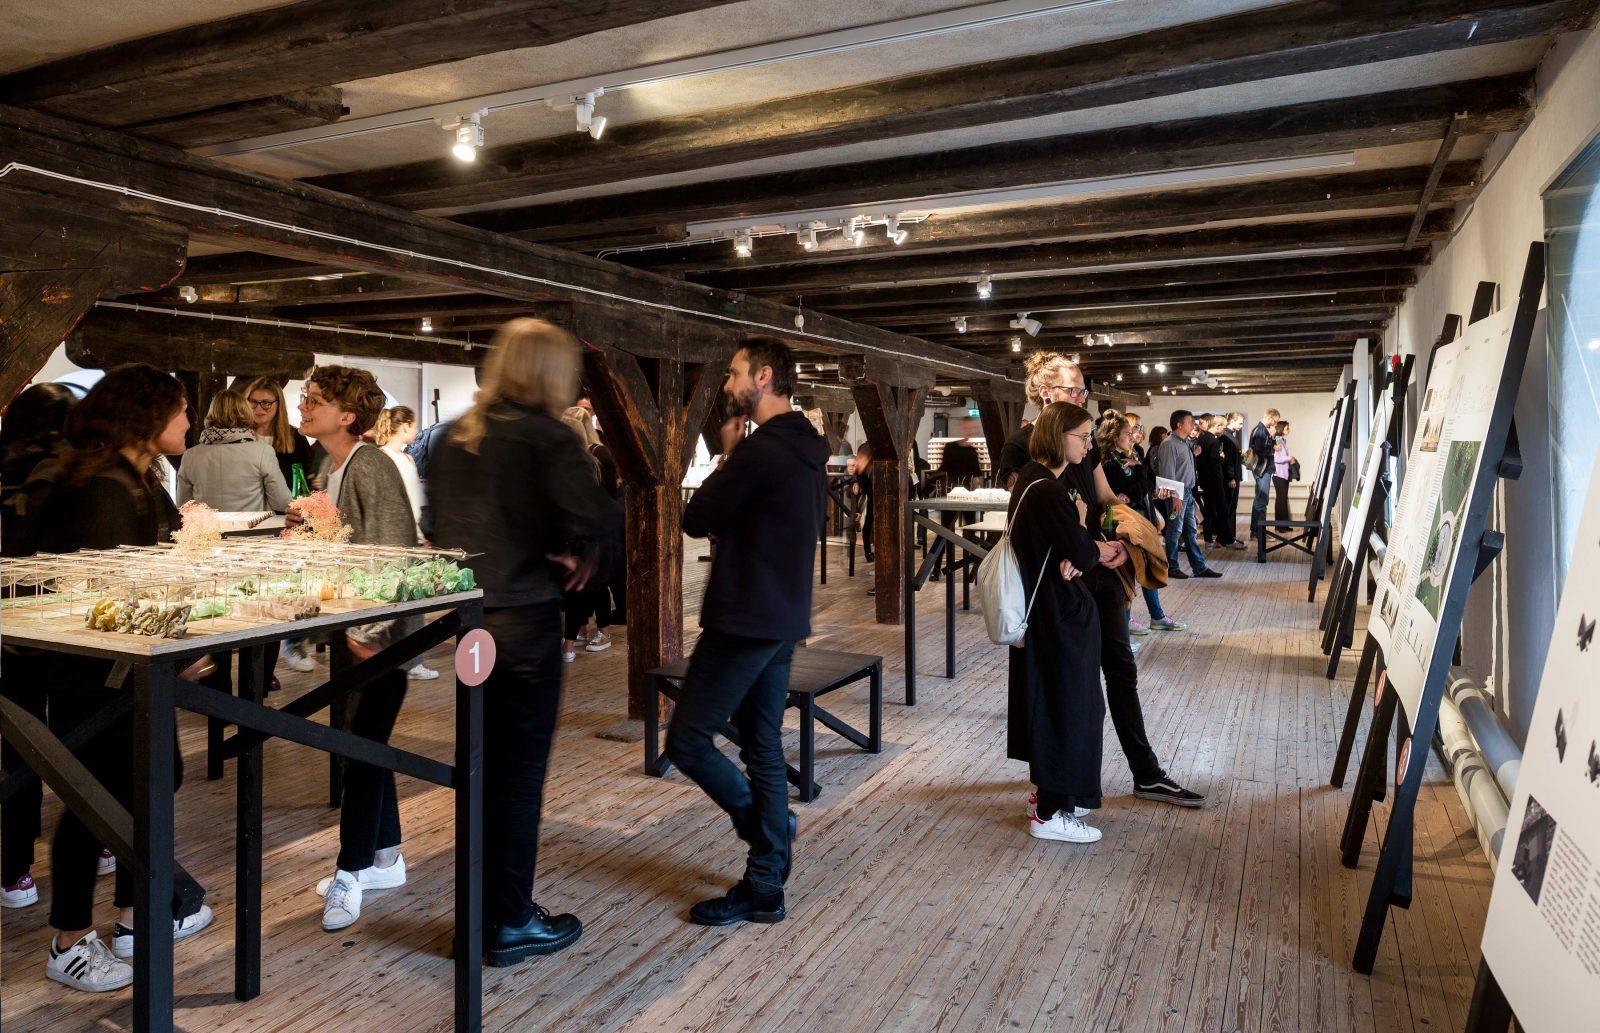 KjellanderSjoberg CK exhibitionview3 3600x2324px